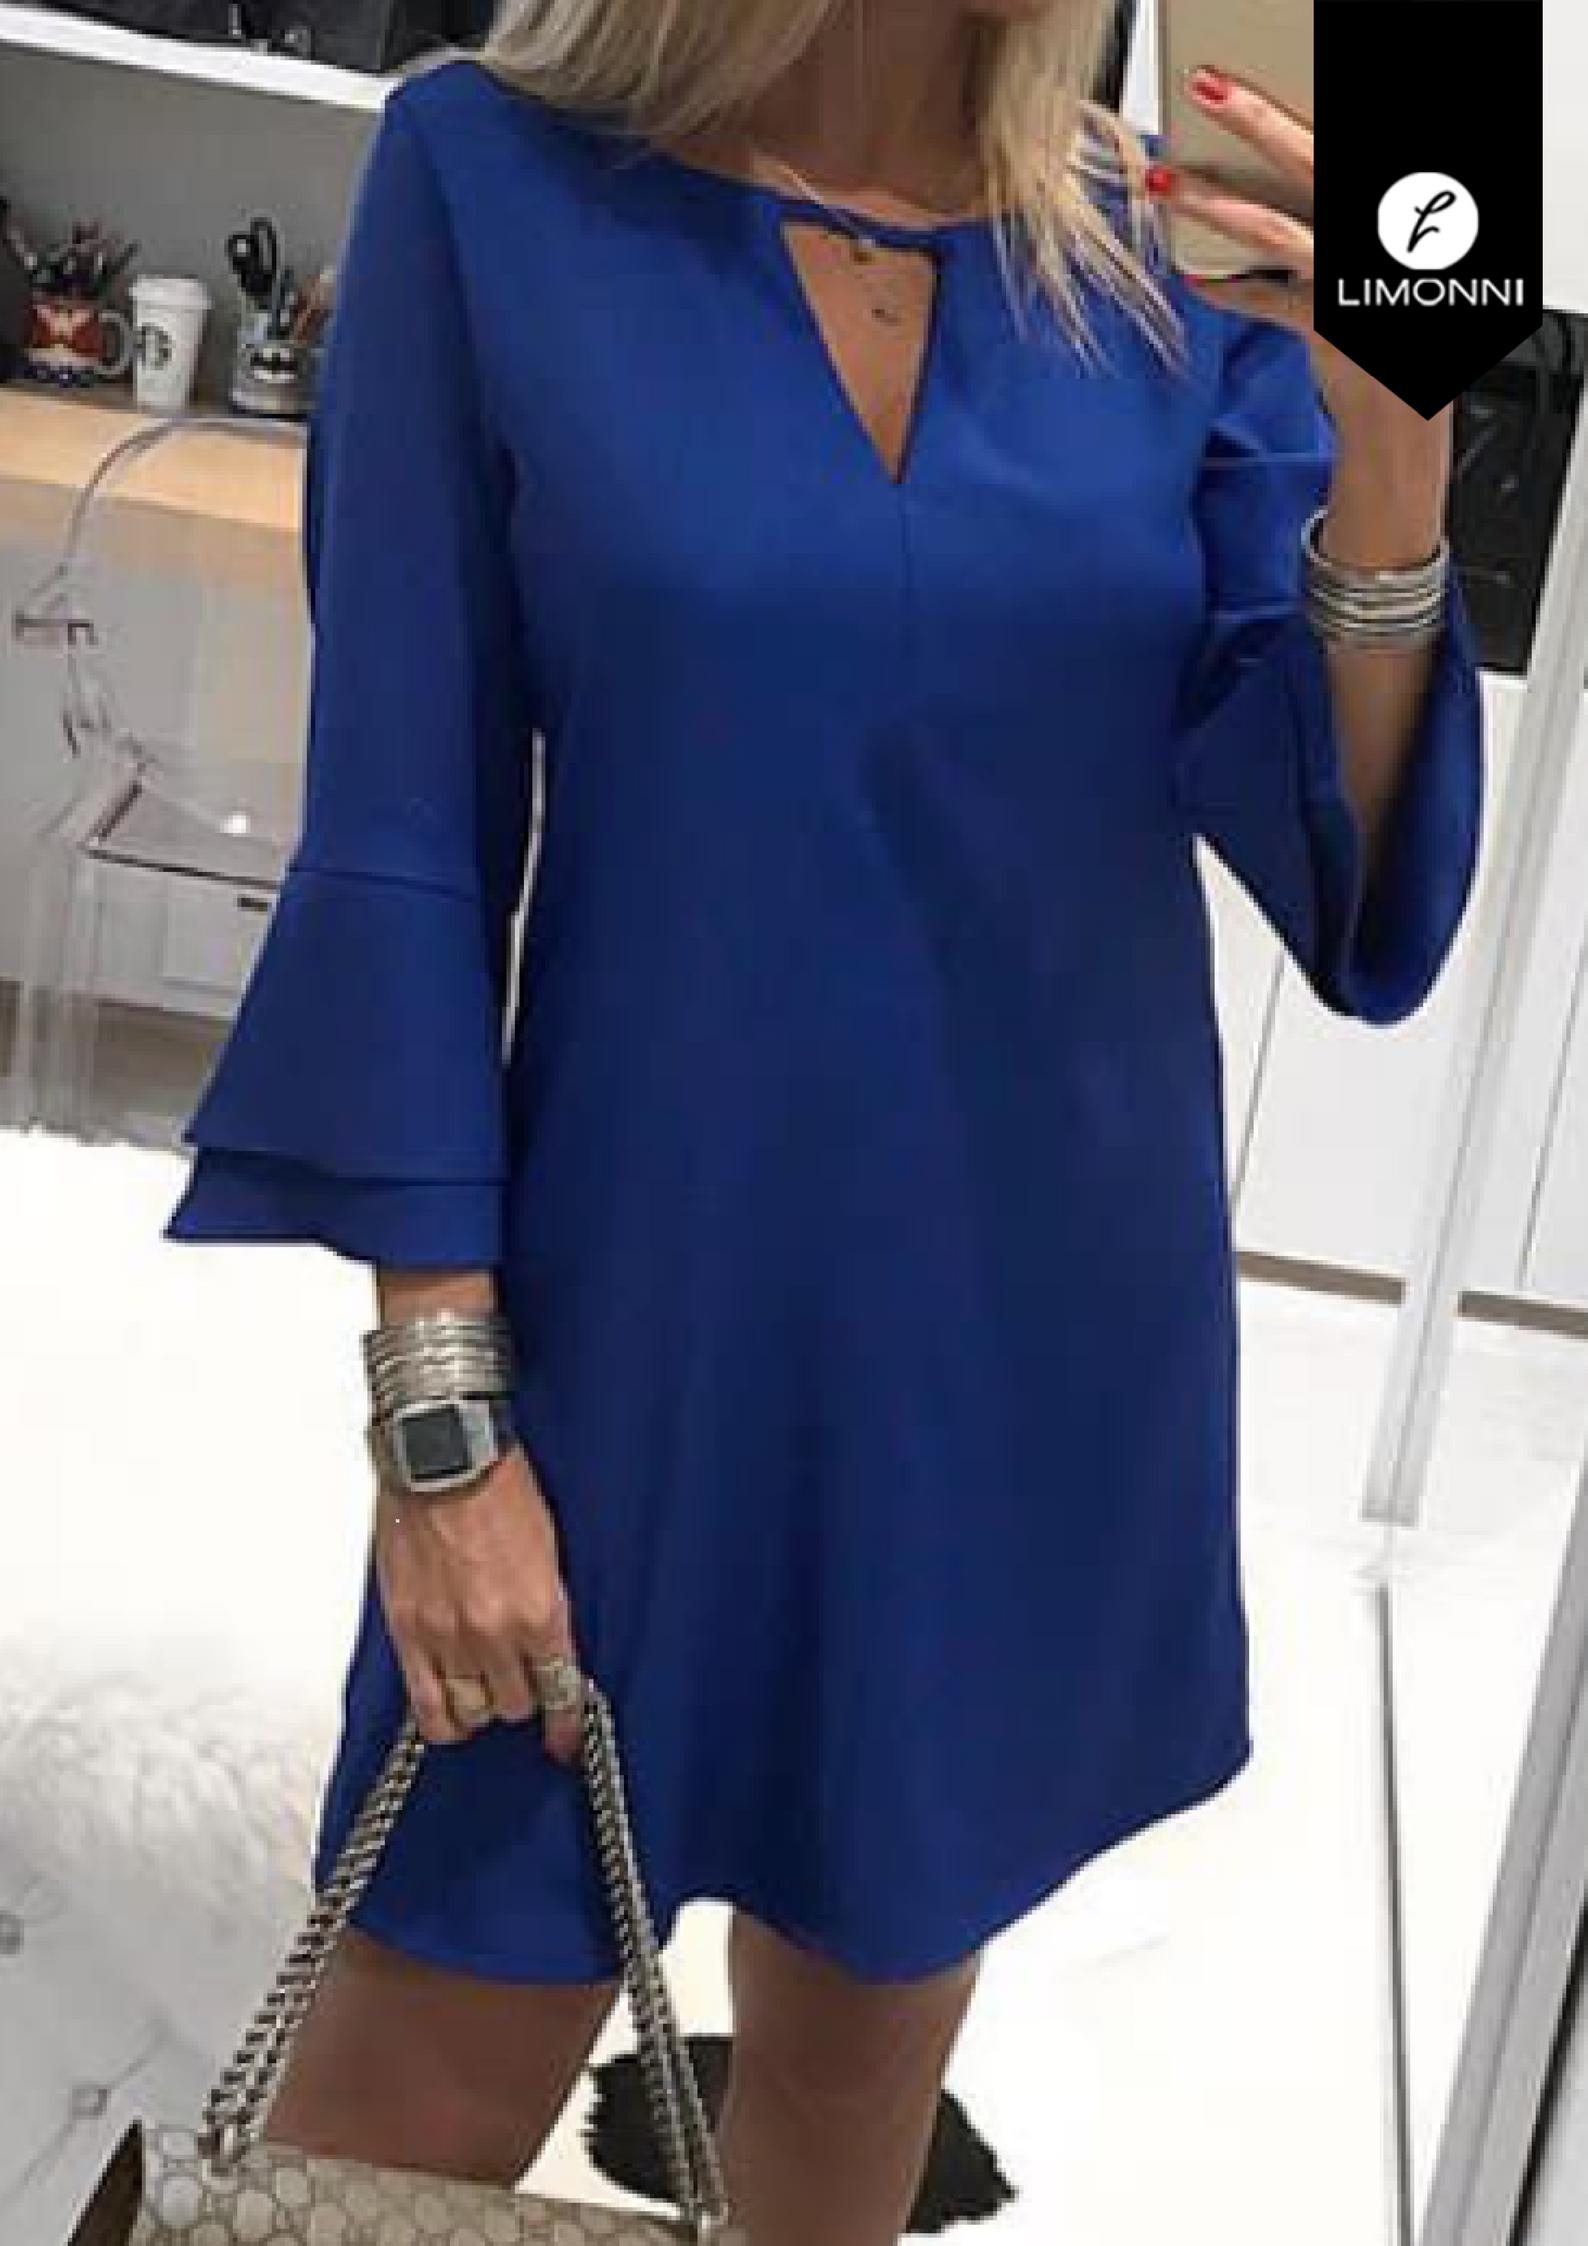 Vestidos para mujer Limonni Bennett LI1354 Cortos Casuales